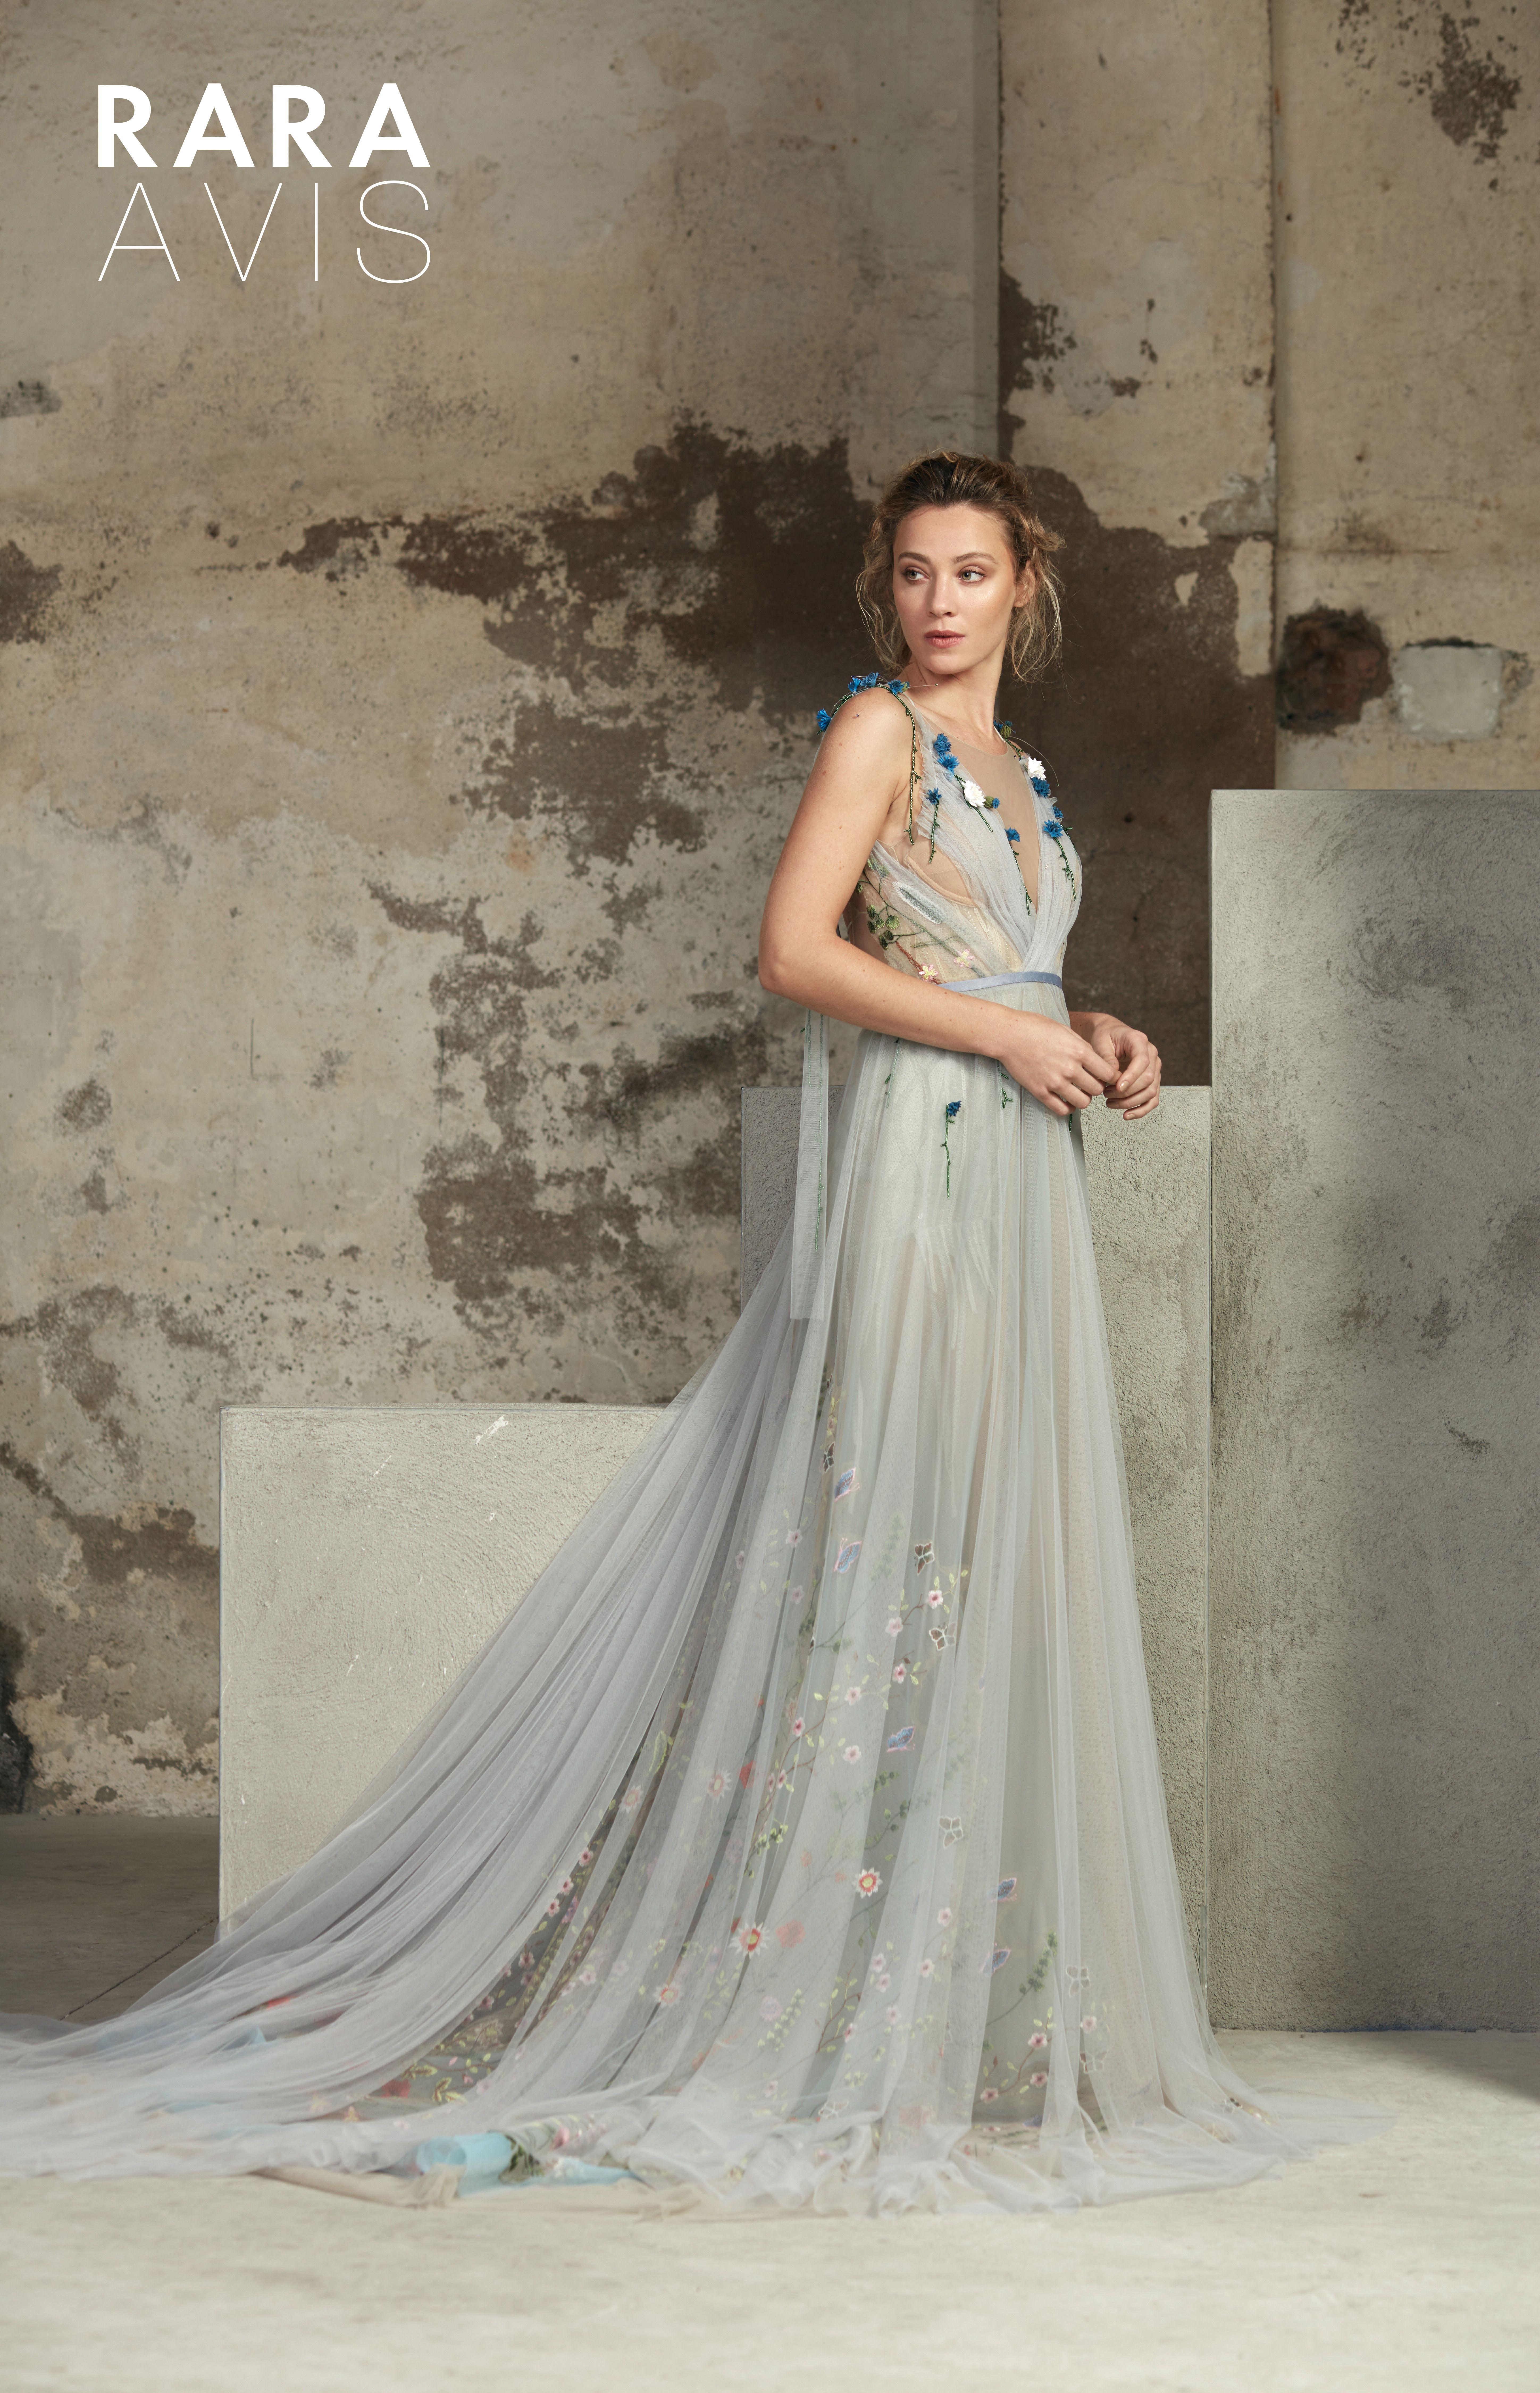 Pin by RARA AVIS on Wedding Dresses | Pinterest | Wedding stuff ...